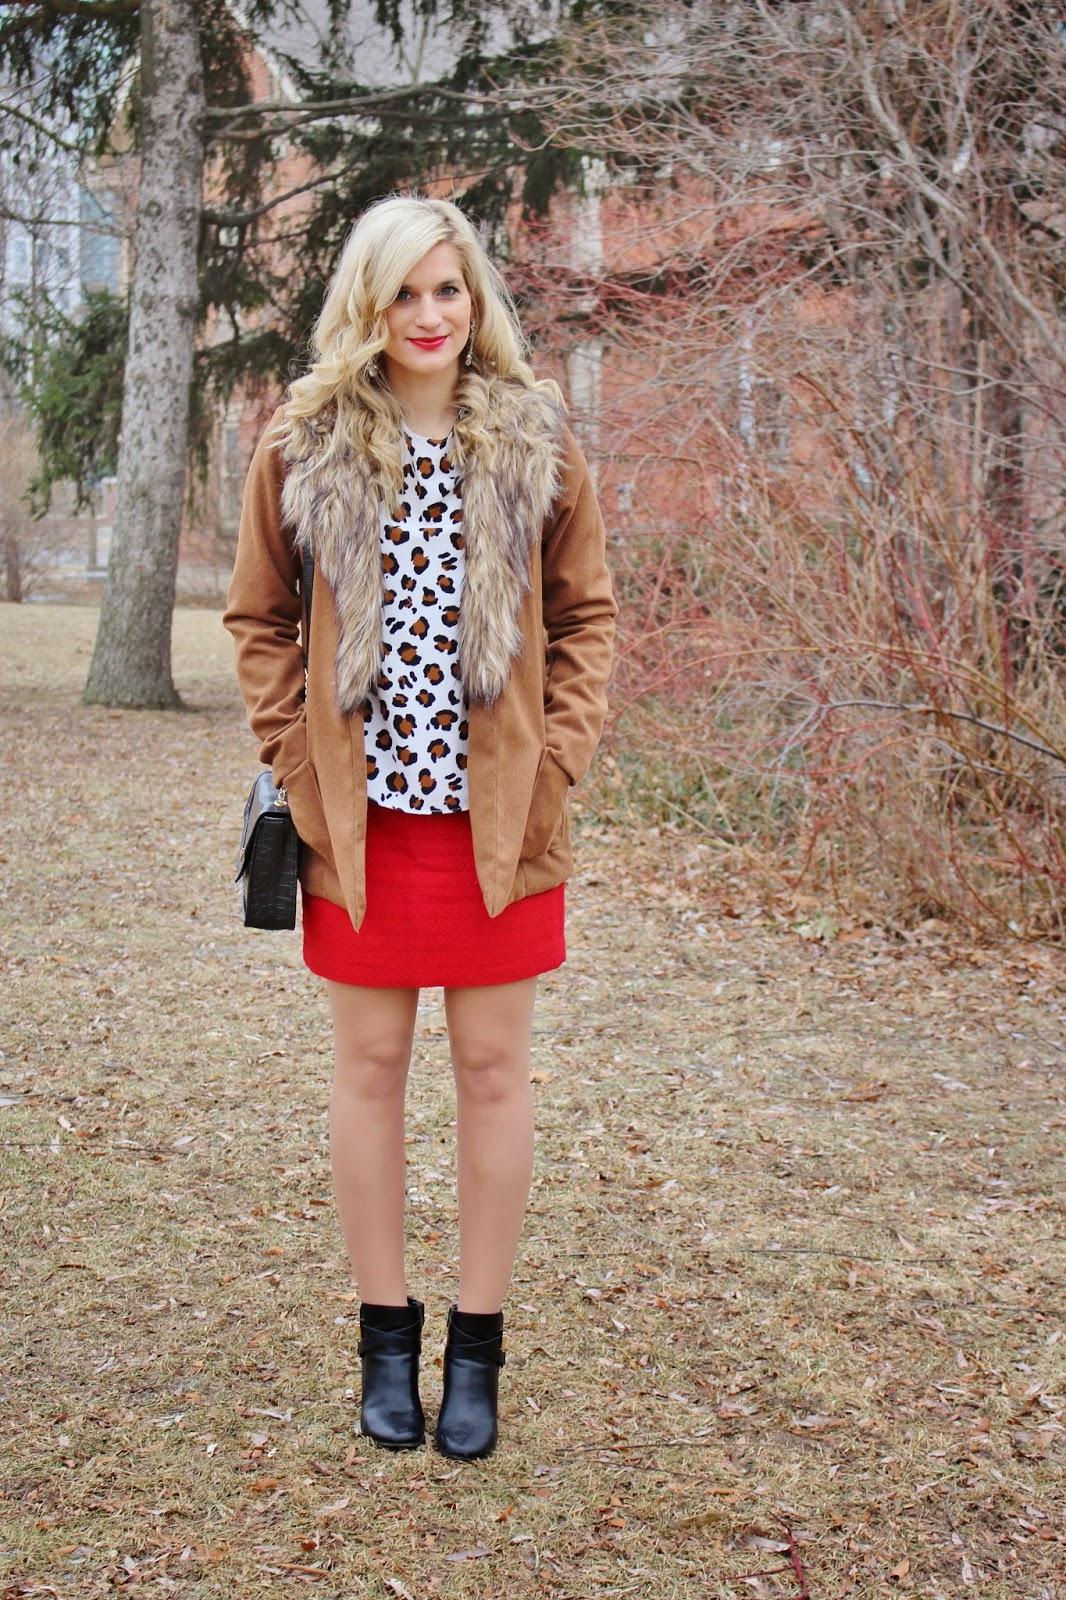 bijuleni, red skirt, print top, winter, banana republic,forever21, zara, Old Navy